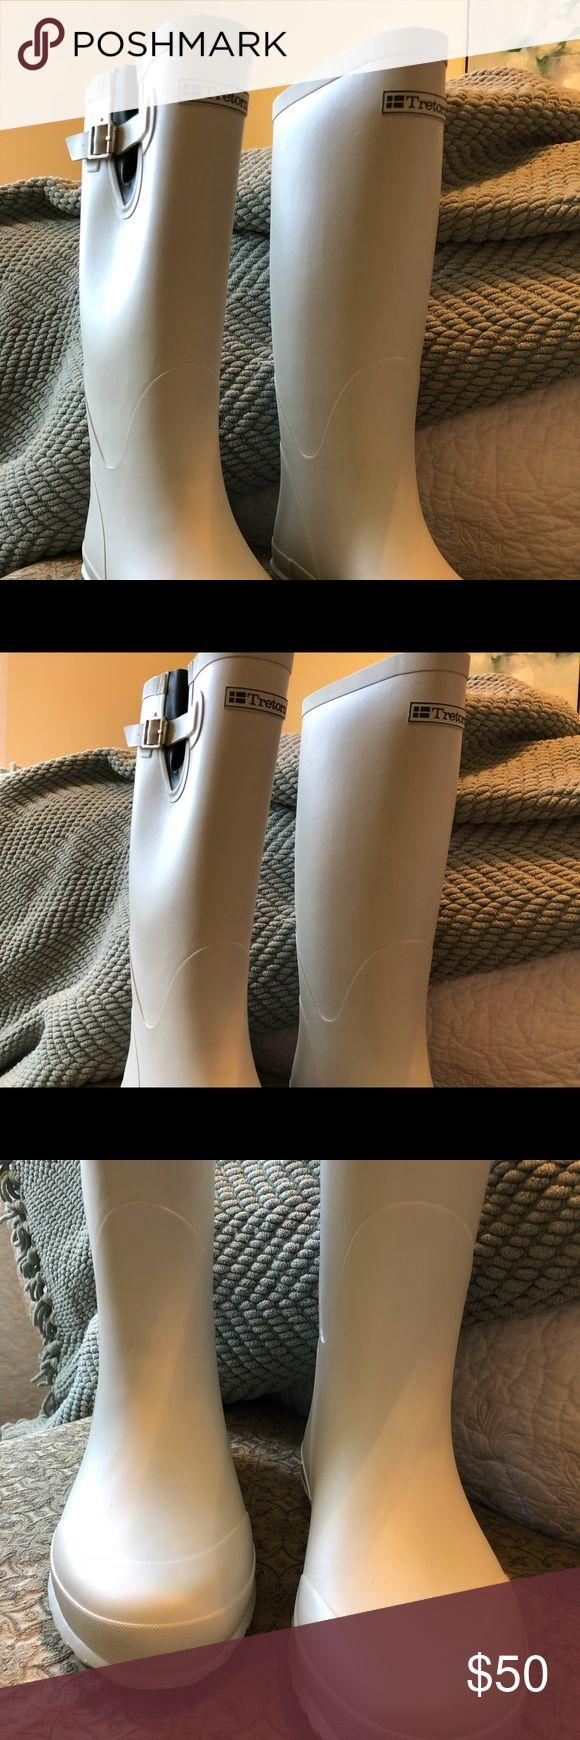 Brand new Rain Boots never worn Tretorn boots in heavy white rubber  sz 38/8 Tretorn Shoes Winter & Rain Boots